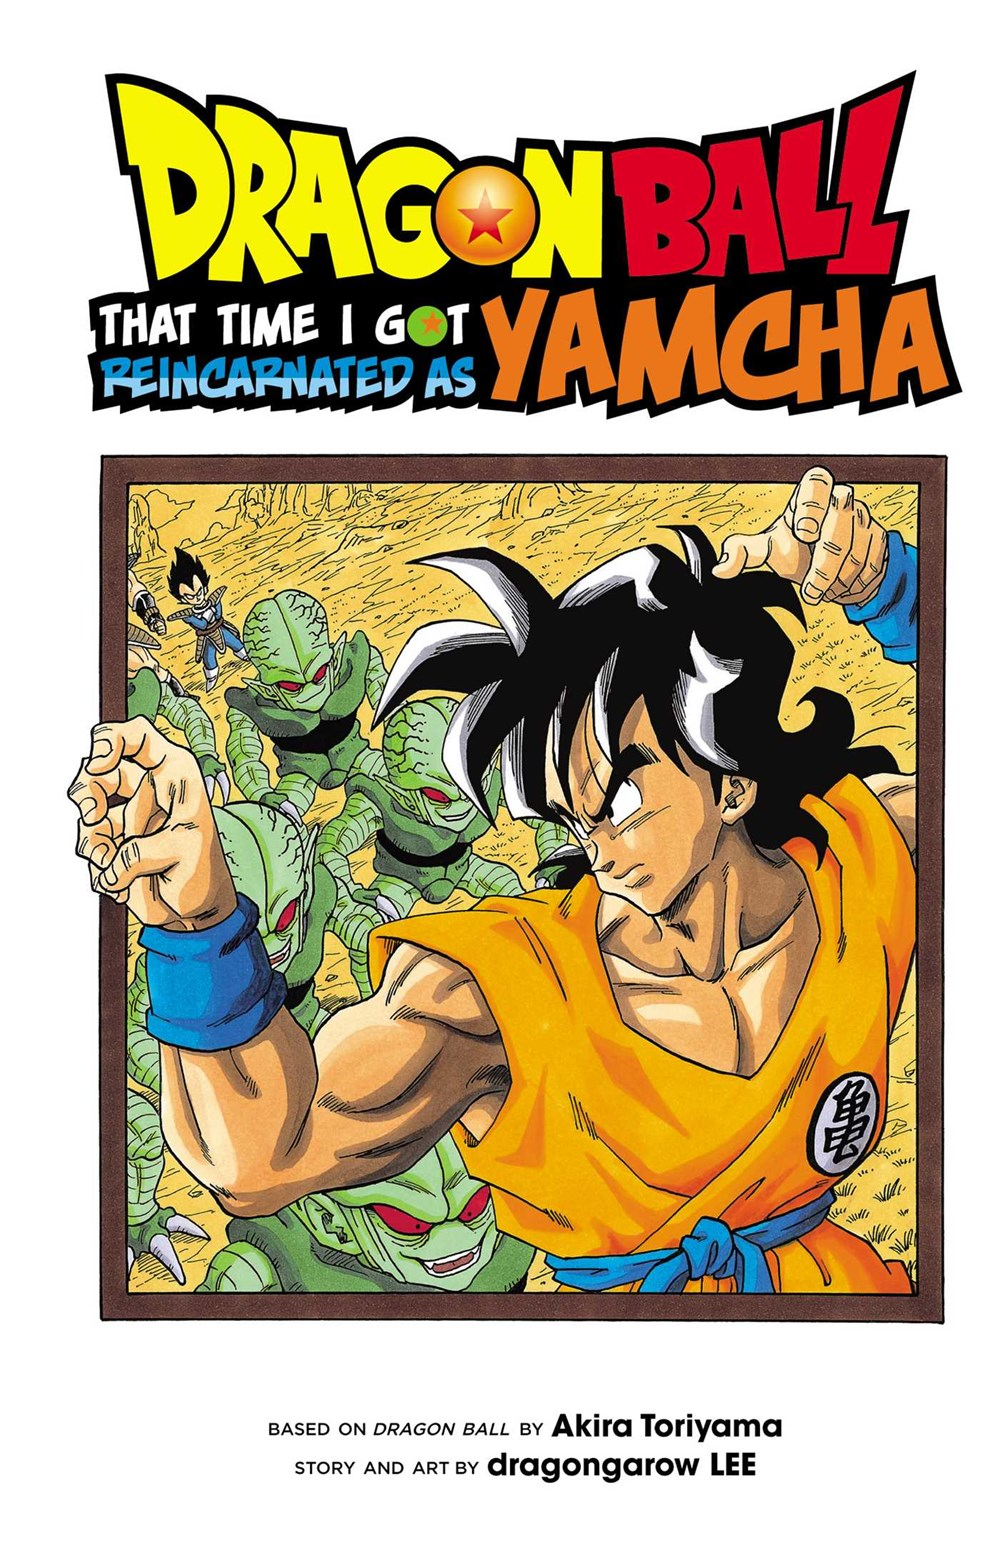 Dragon Ball That Time I Got Reincarnated as Yamcha! Manga Volume 1